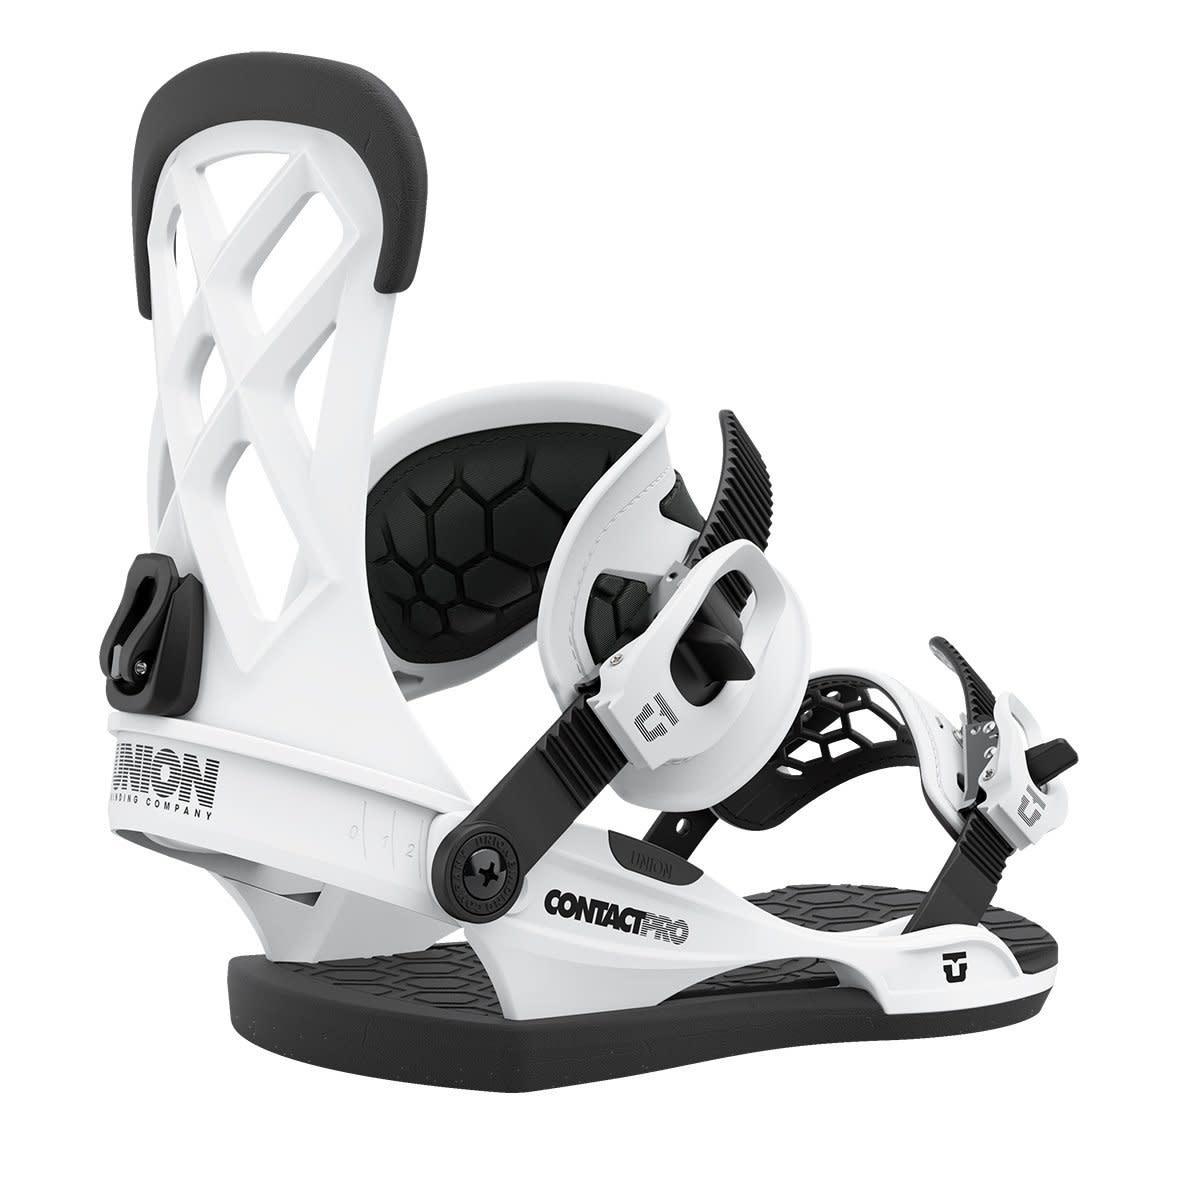 Union Union Men's Contact Pro Snowboard Binding (2021)